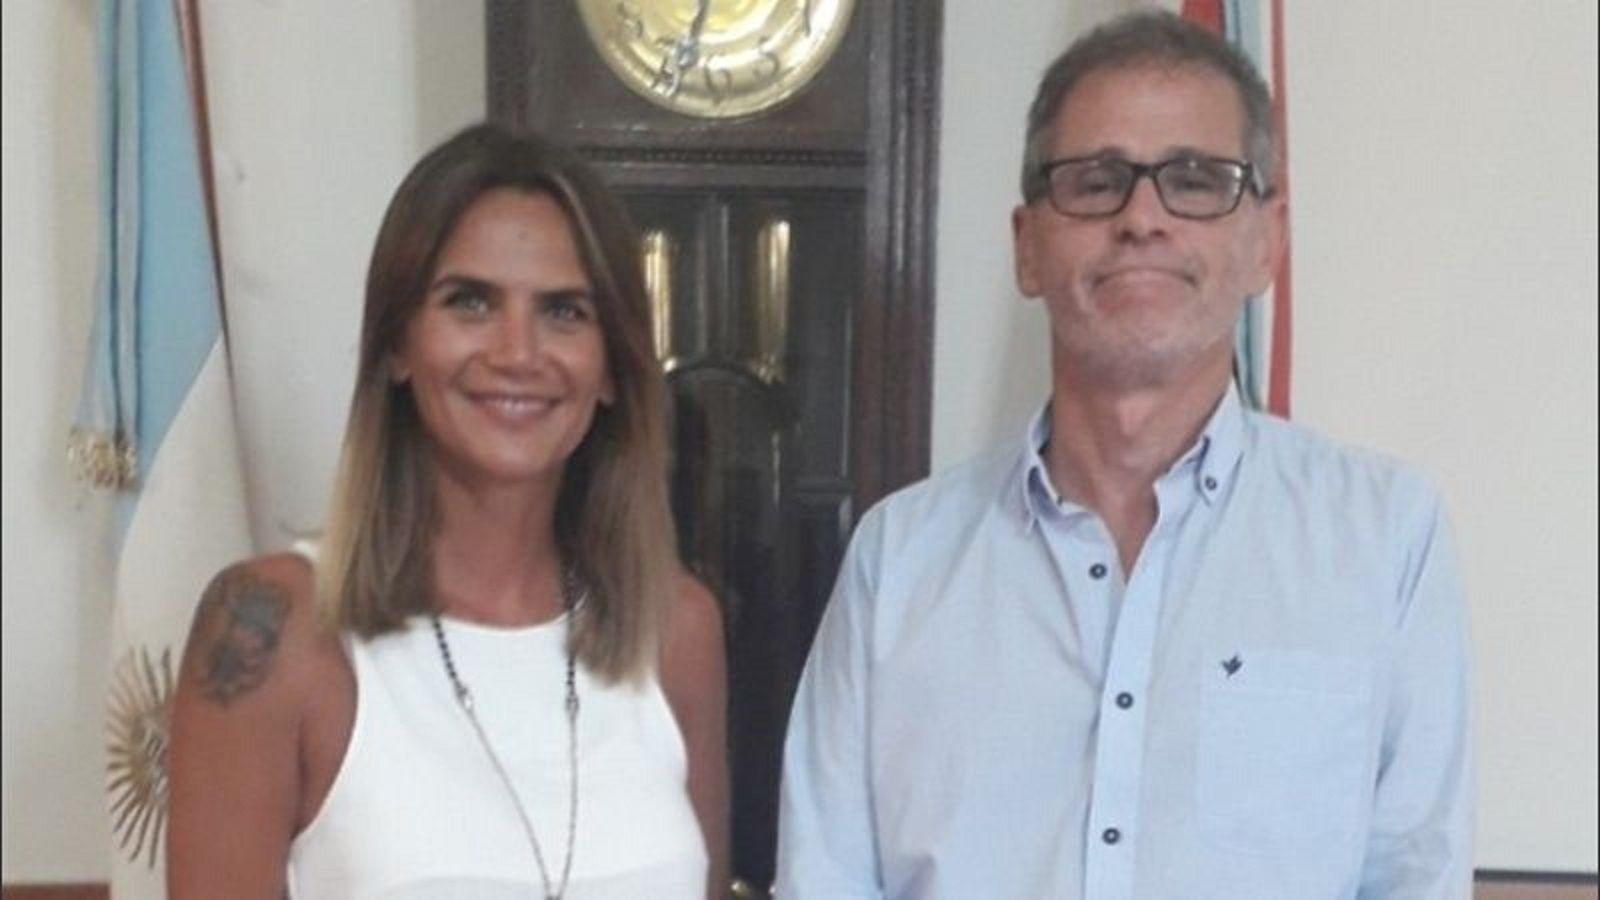 Amalia Granata con el Ministro Dr. Esteban Borgonovo.